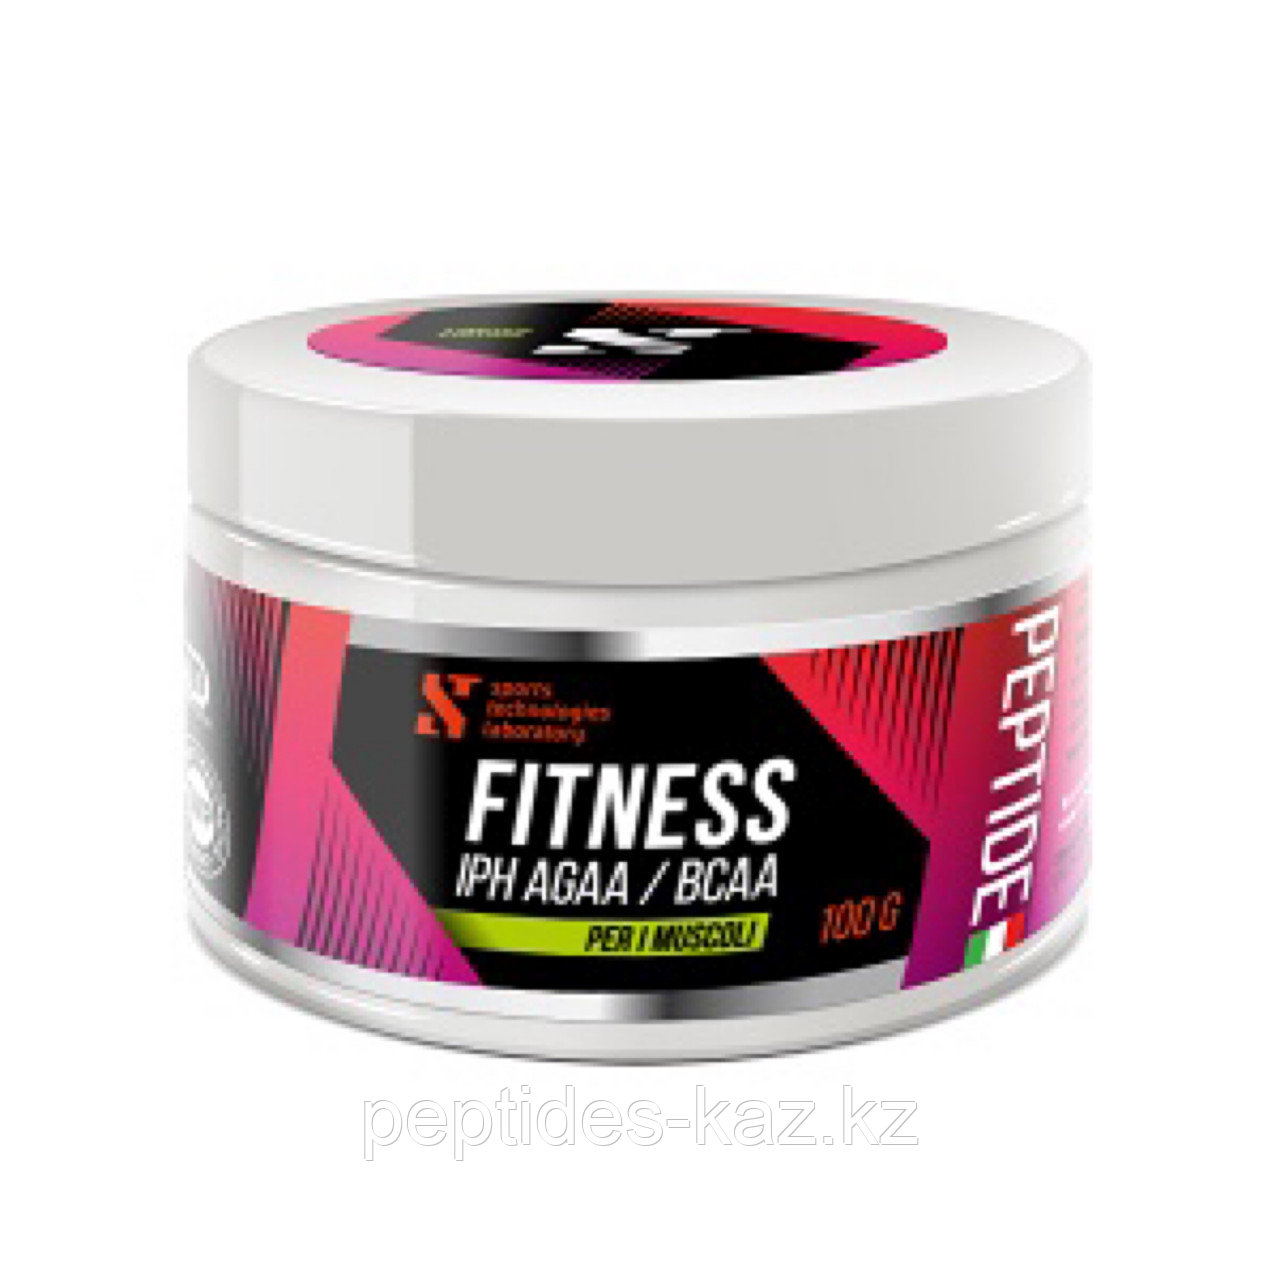 Fitness IPH AGAA Per i muskoli пептидный комплекс для мышц, 100 г - фото 1